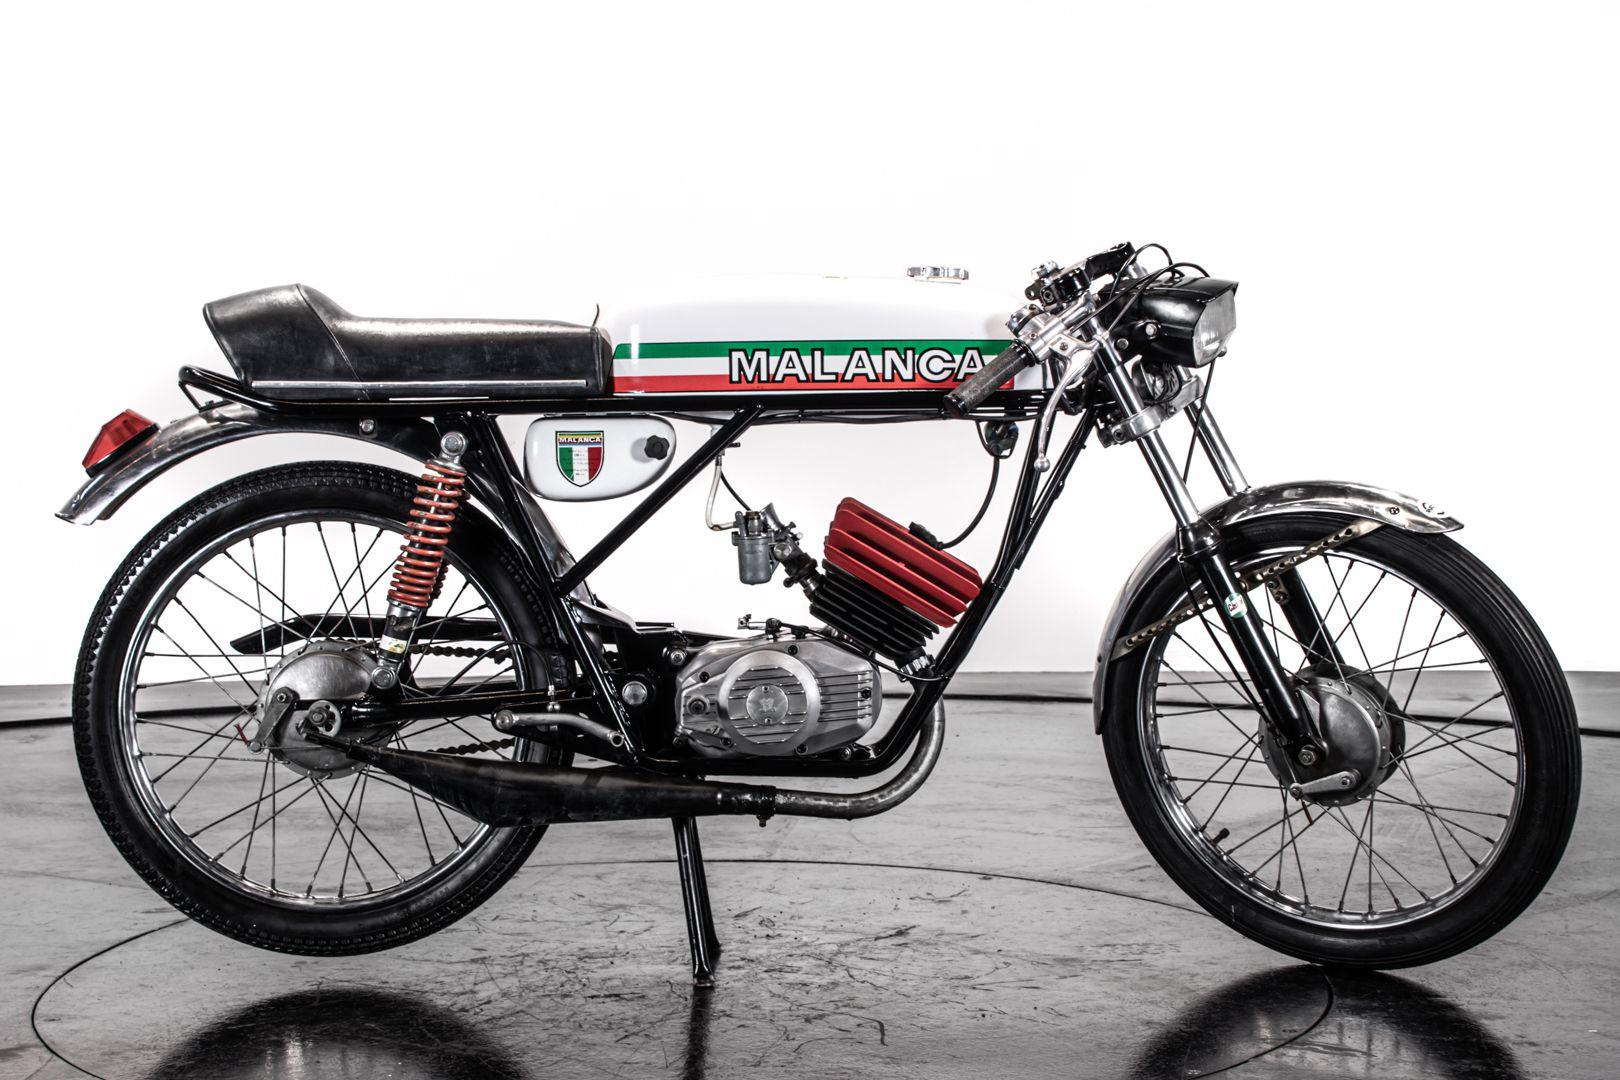 1973 Malanca Testarossa 68961